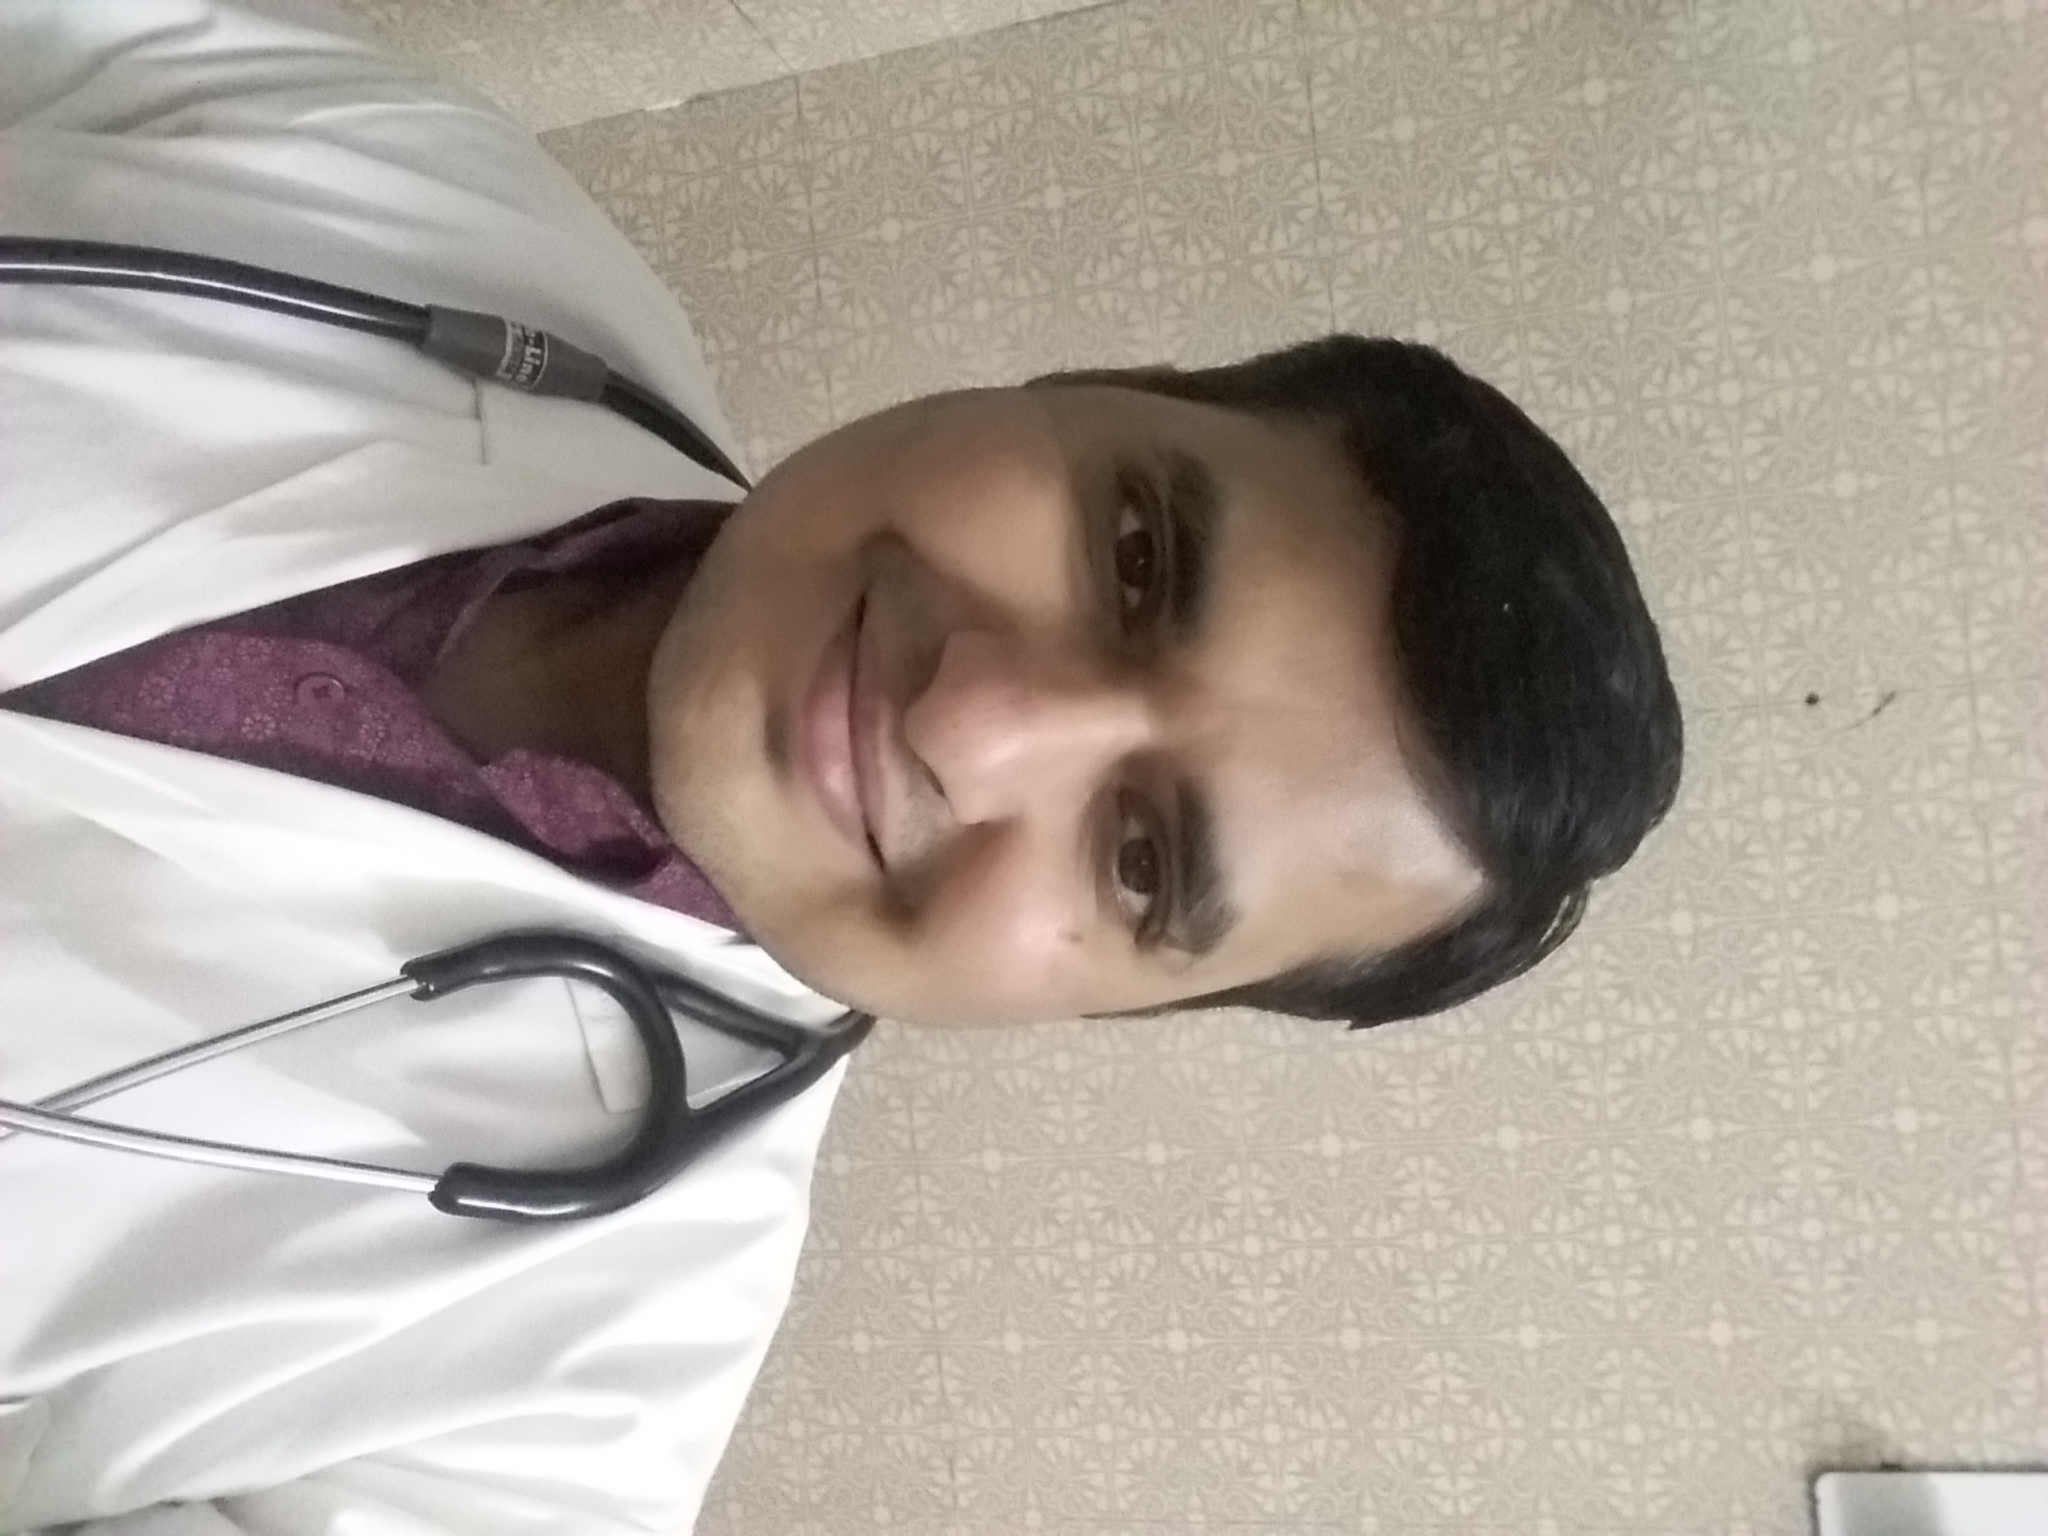 Dr. Kamal Kishore Verma